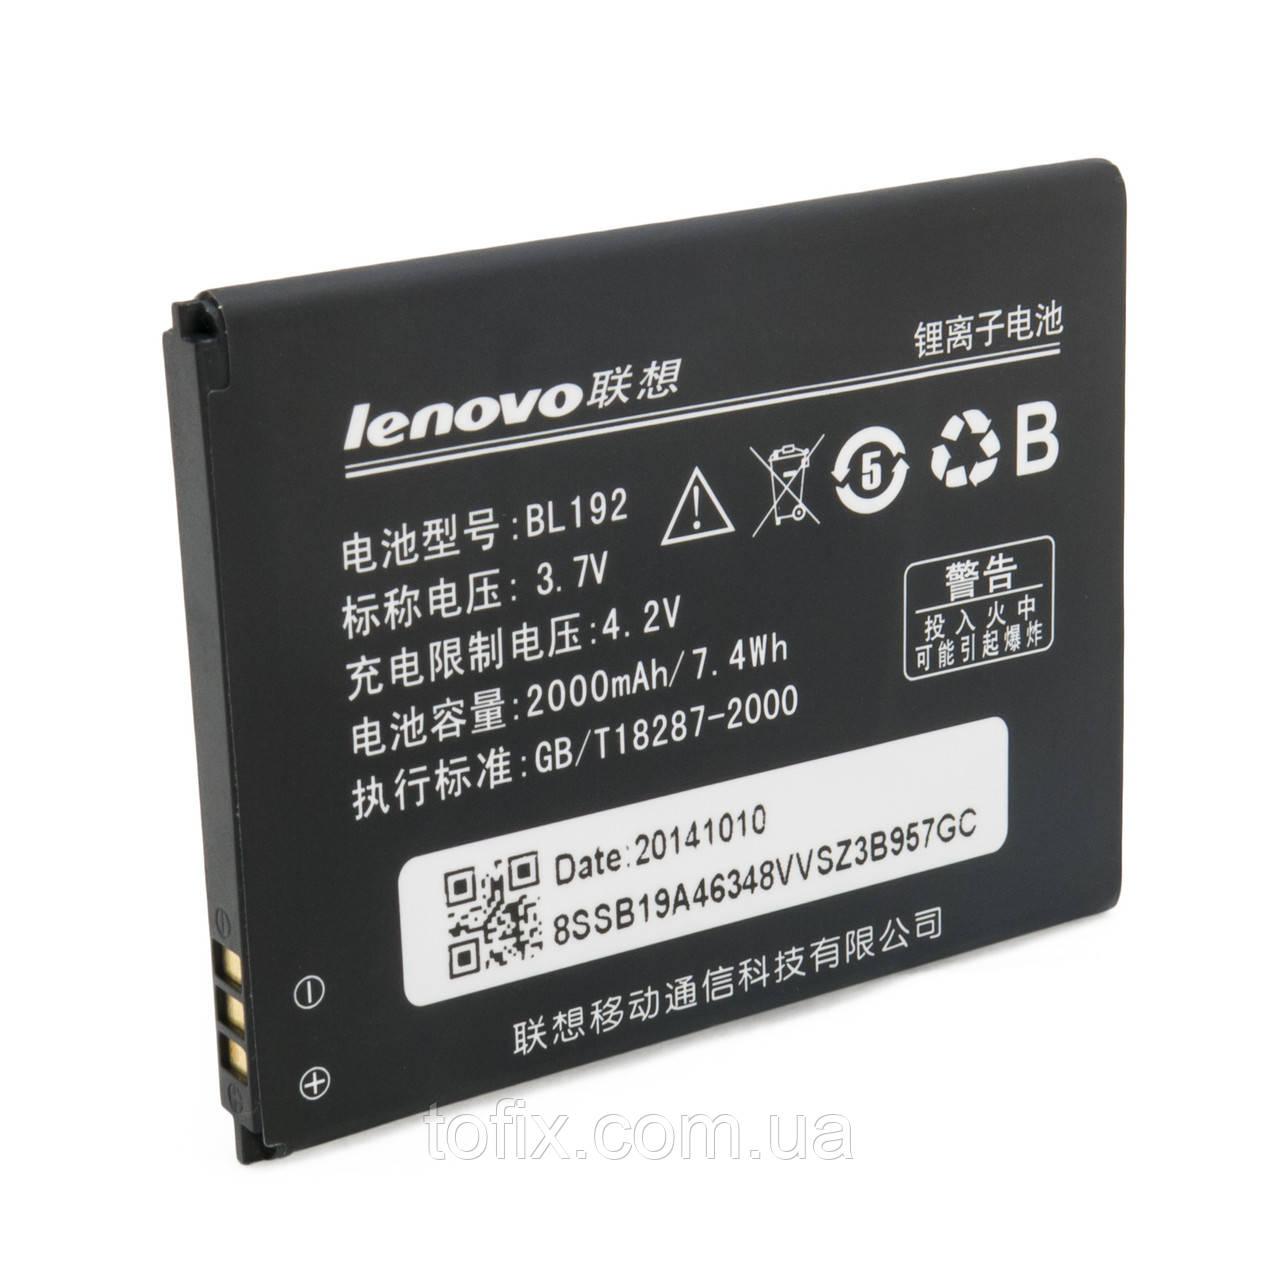 Батарея (акб, акумулятор) BL192 для Lenovo A529 IdeaPhone, 2000 mAh, оригінал